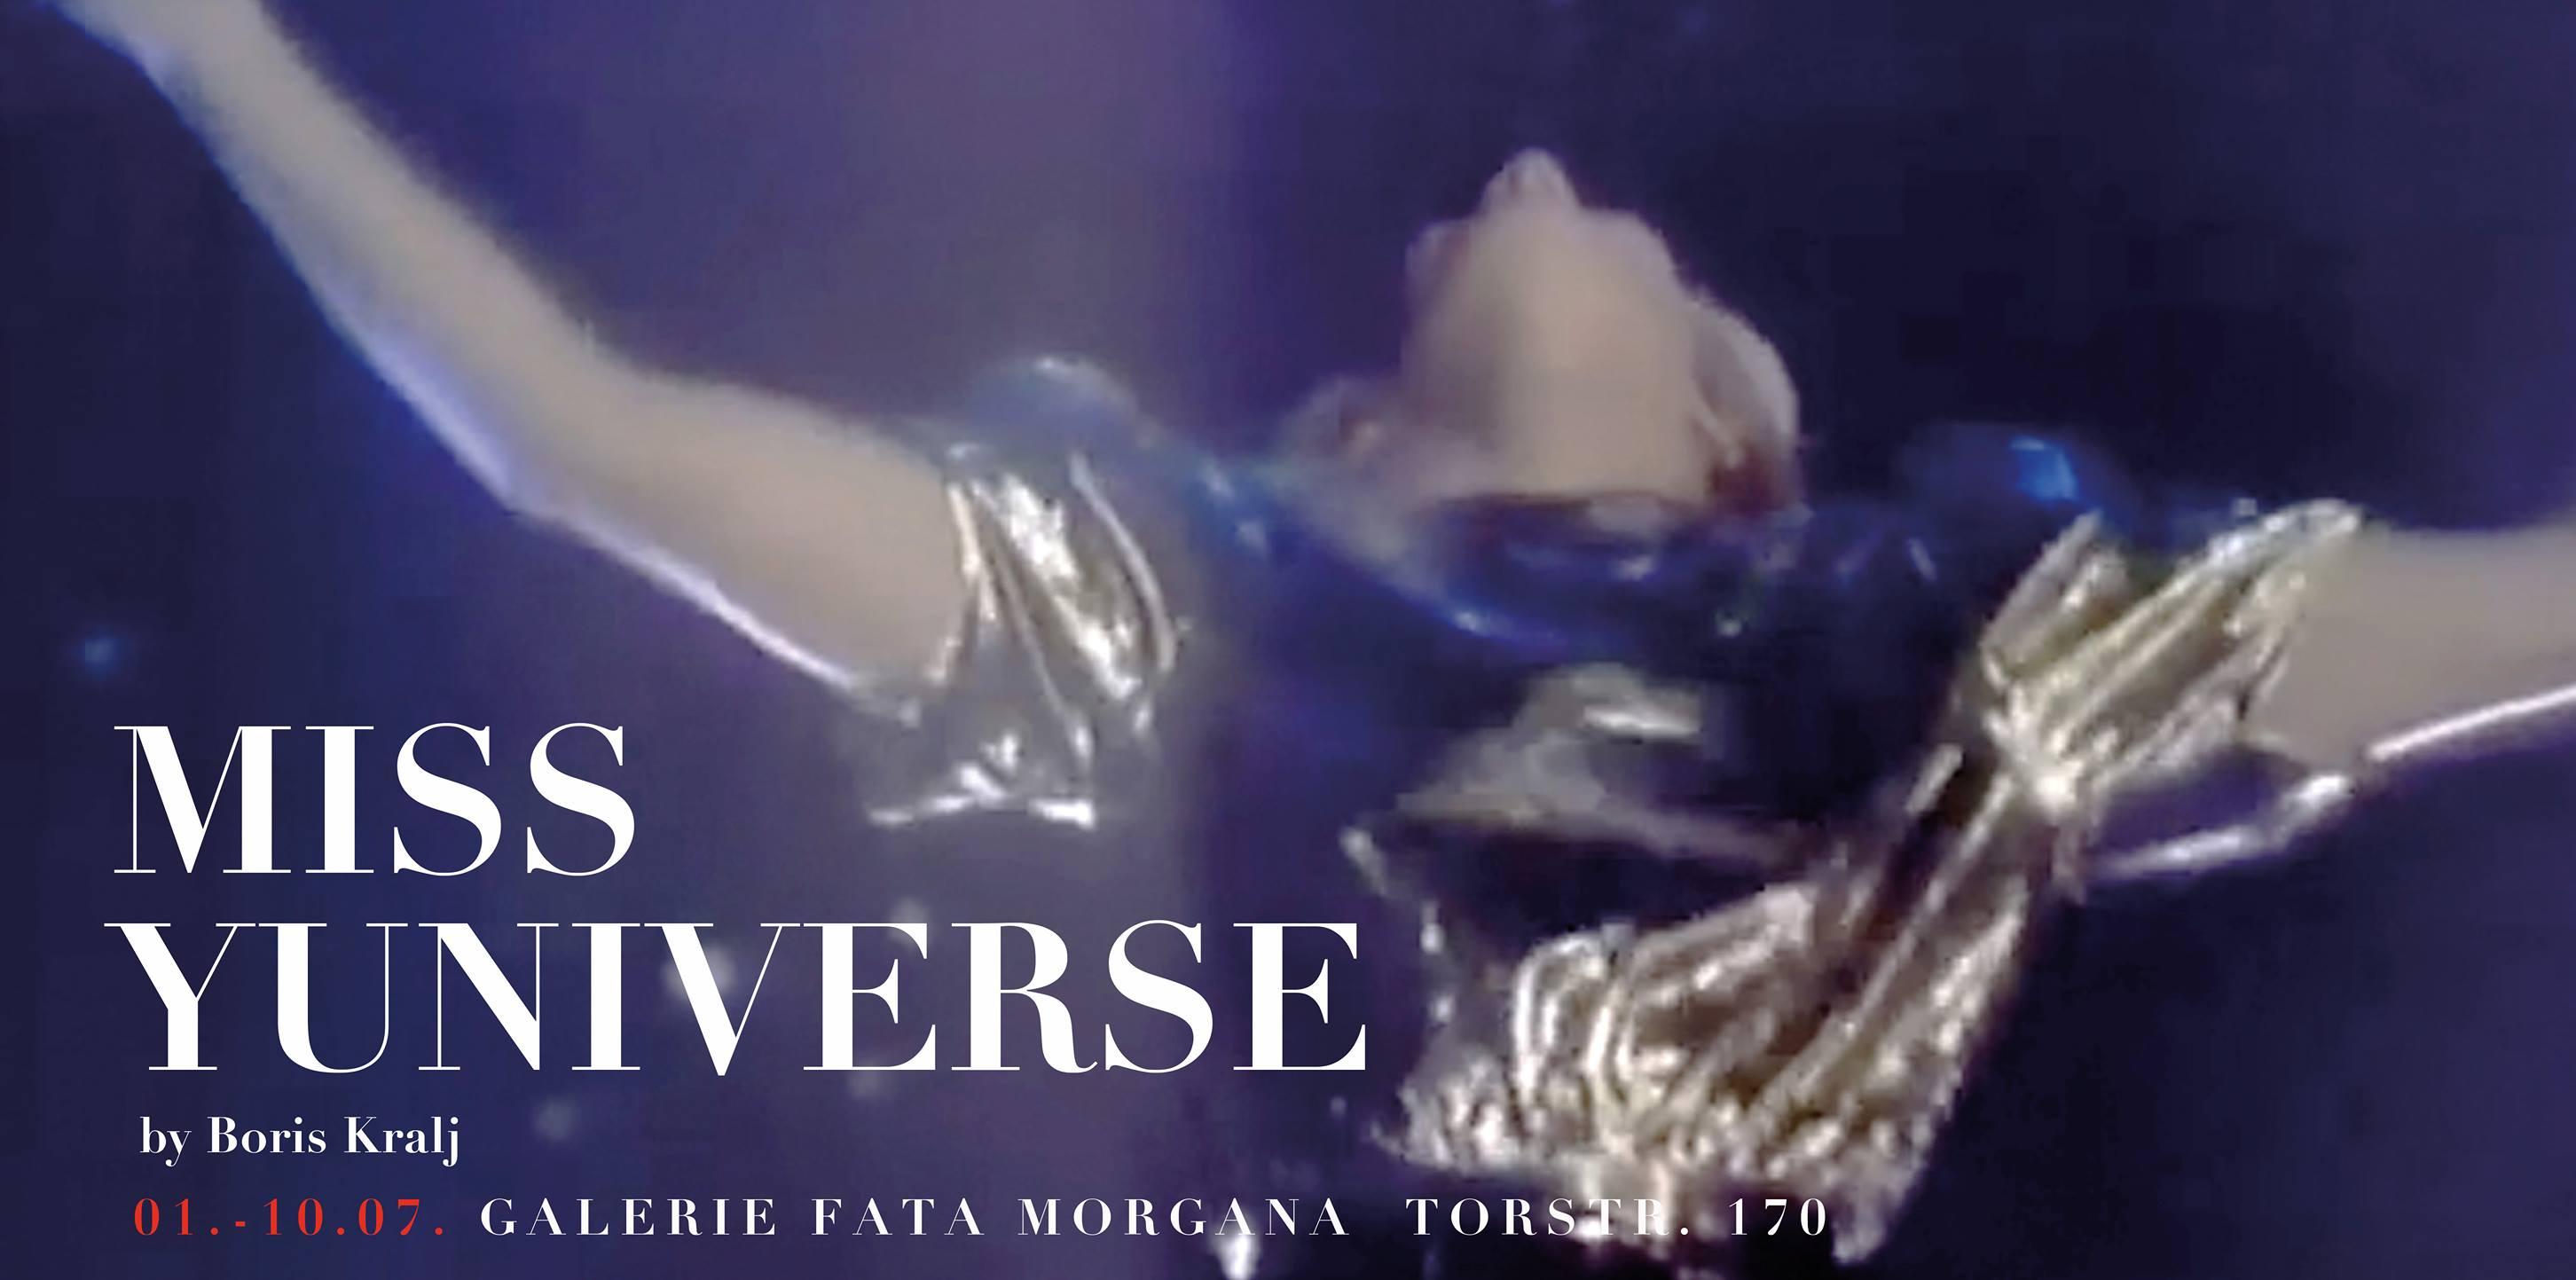 miss yuniverse fata morgana gallery samovino